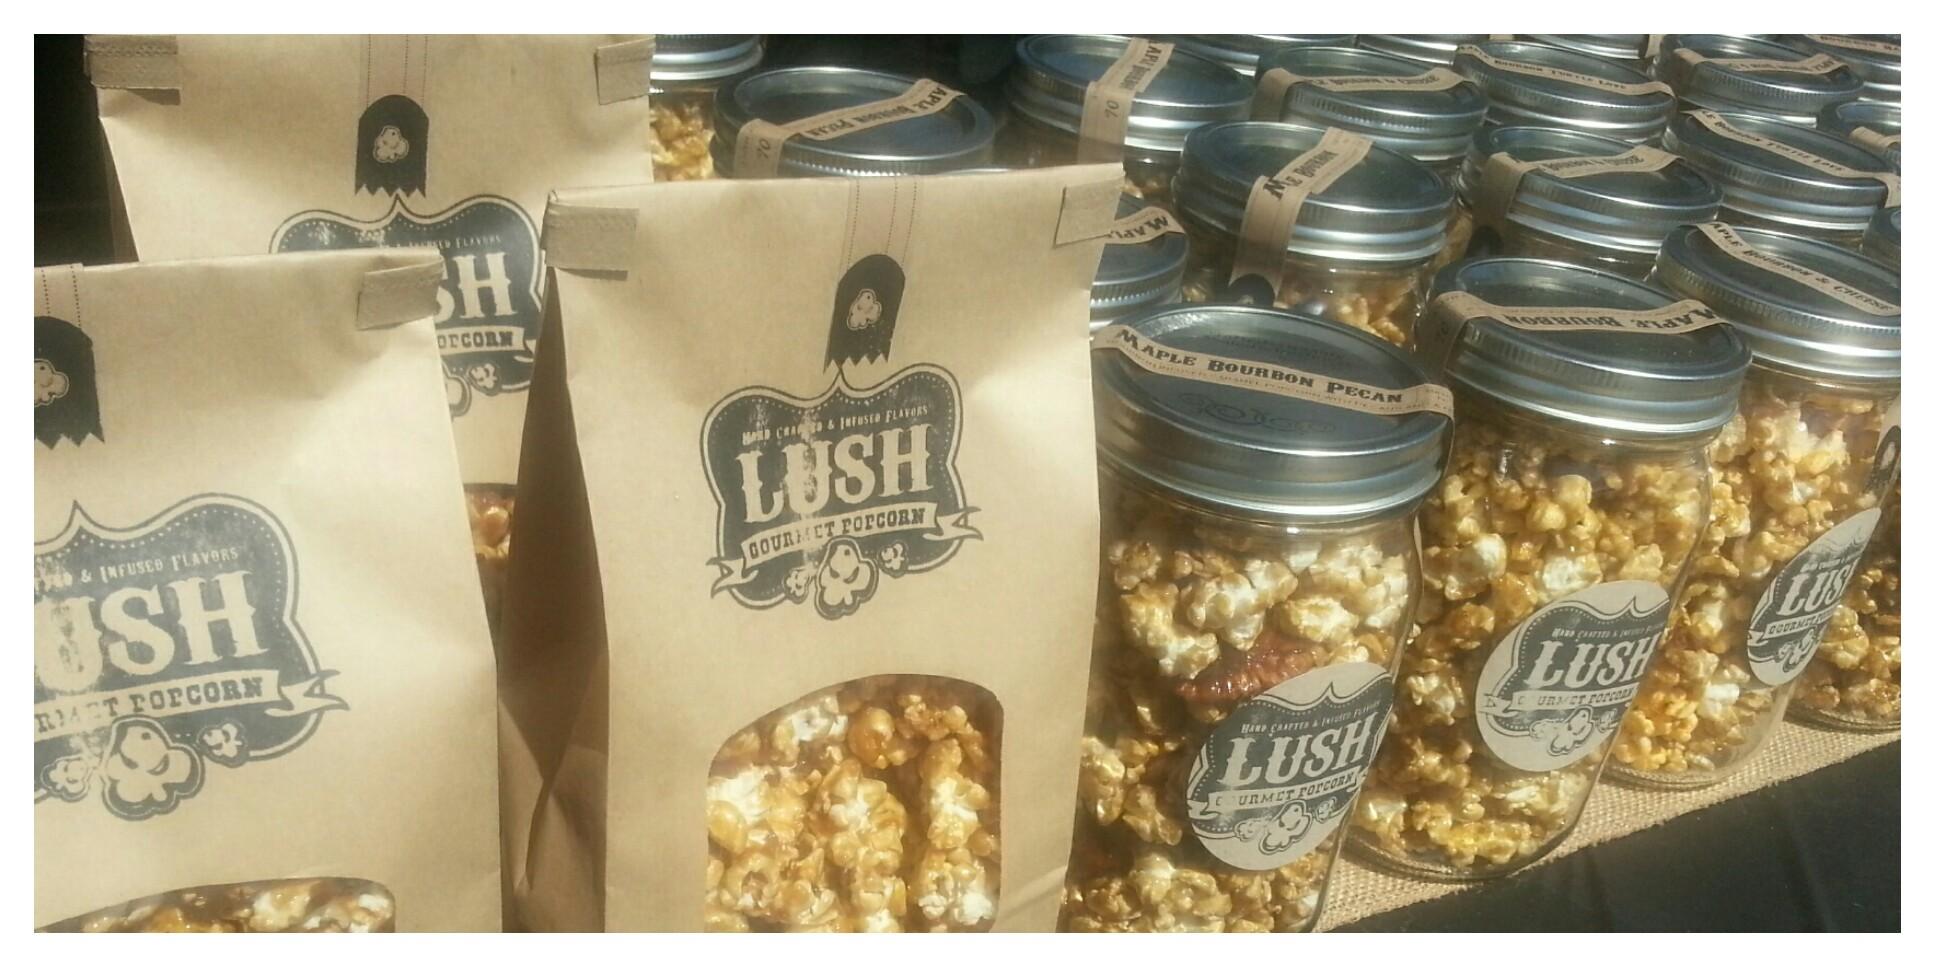 Lush Popcorn